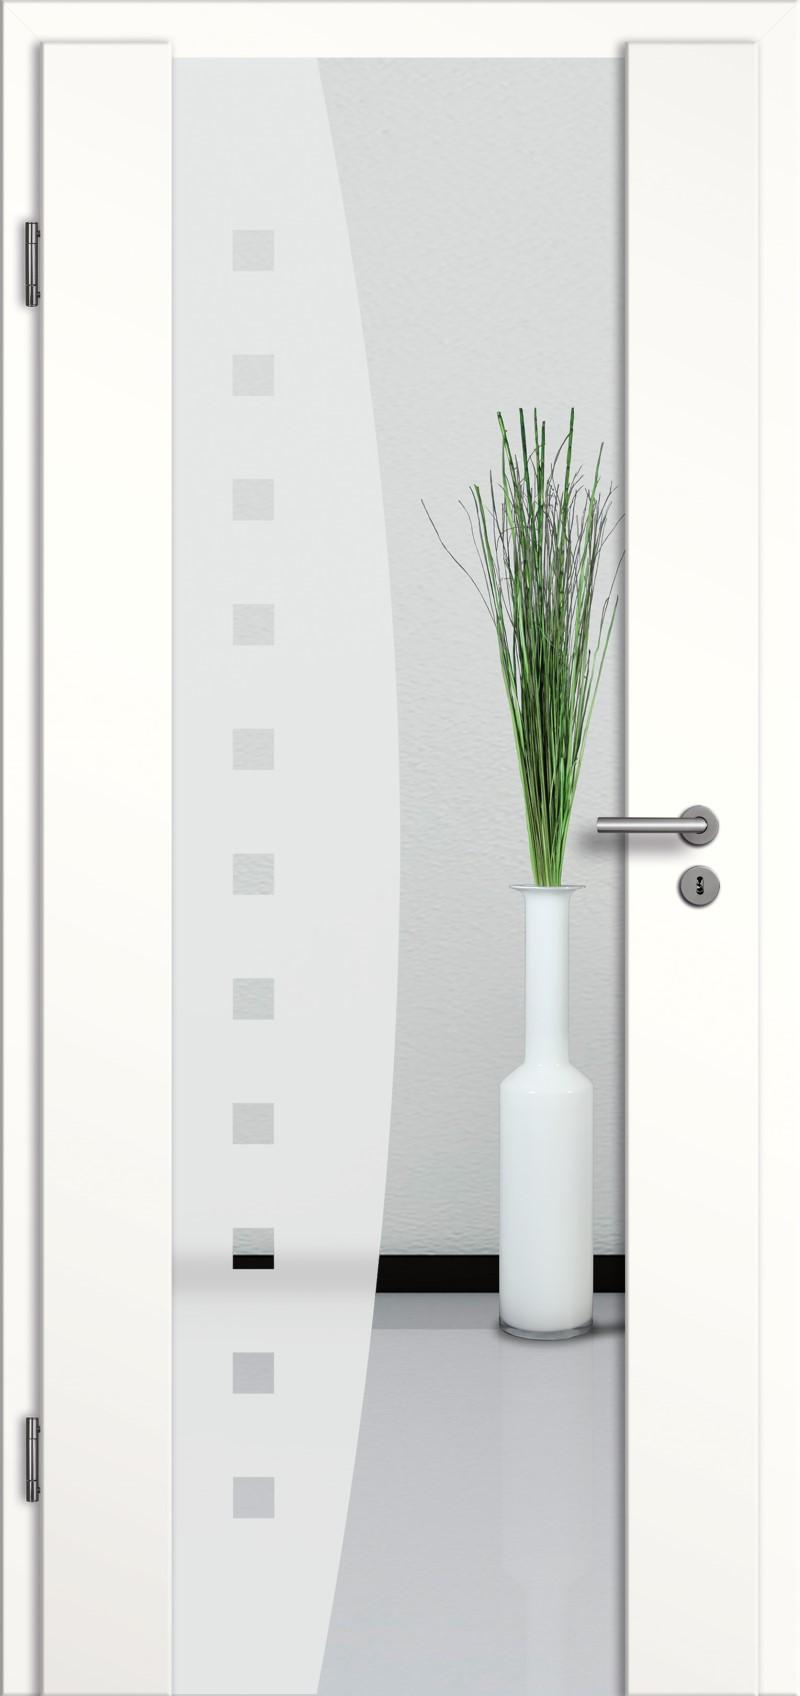 holzglast r mit glasmotiv sand 9 tuer und. Black Bedroom Furniture Sets. Home Design Ideas